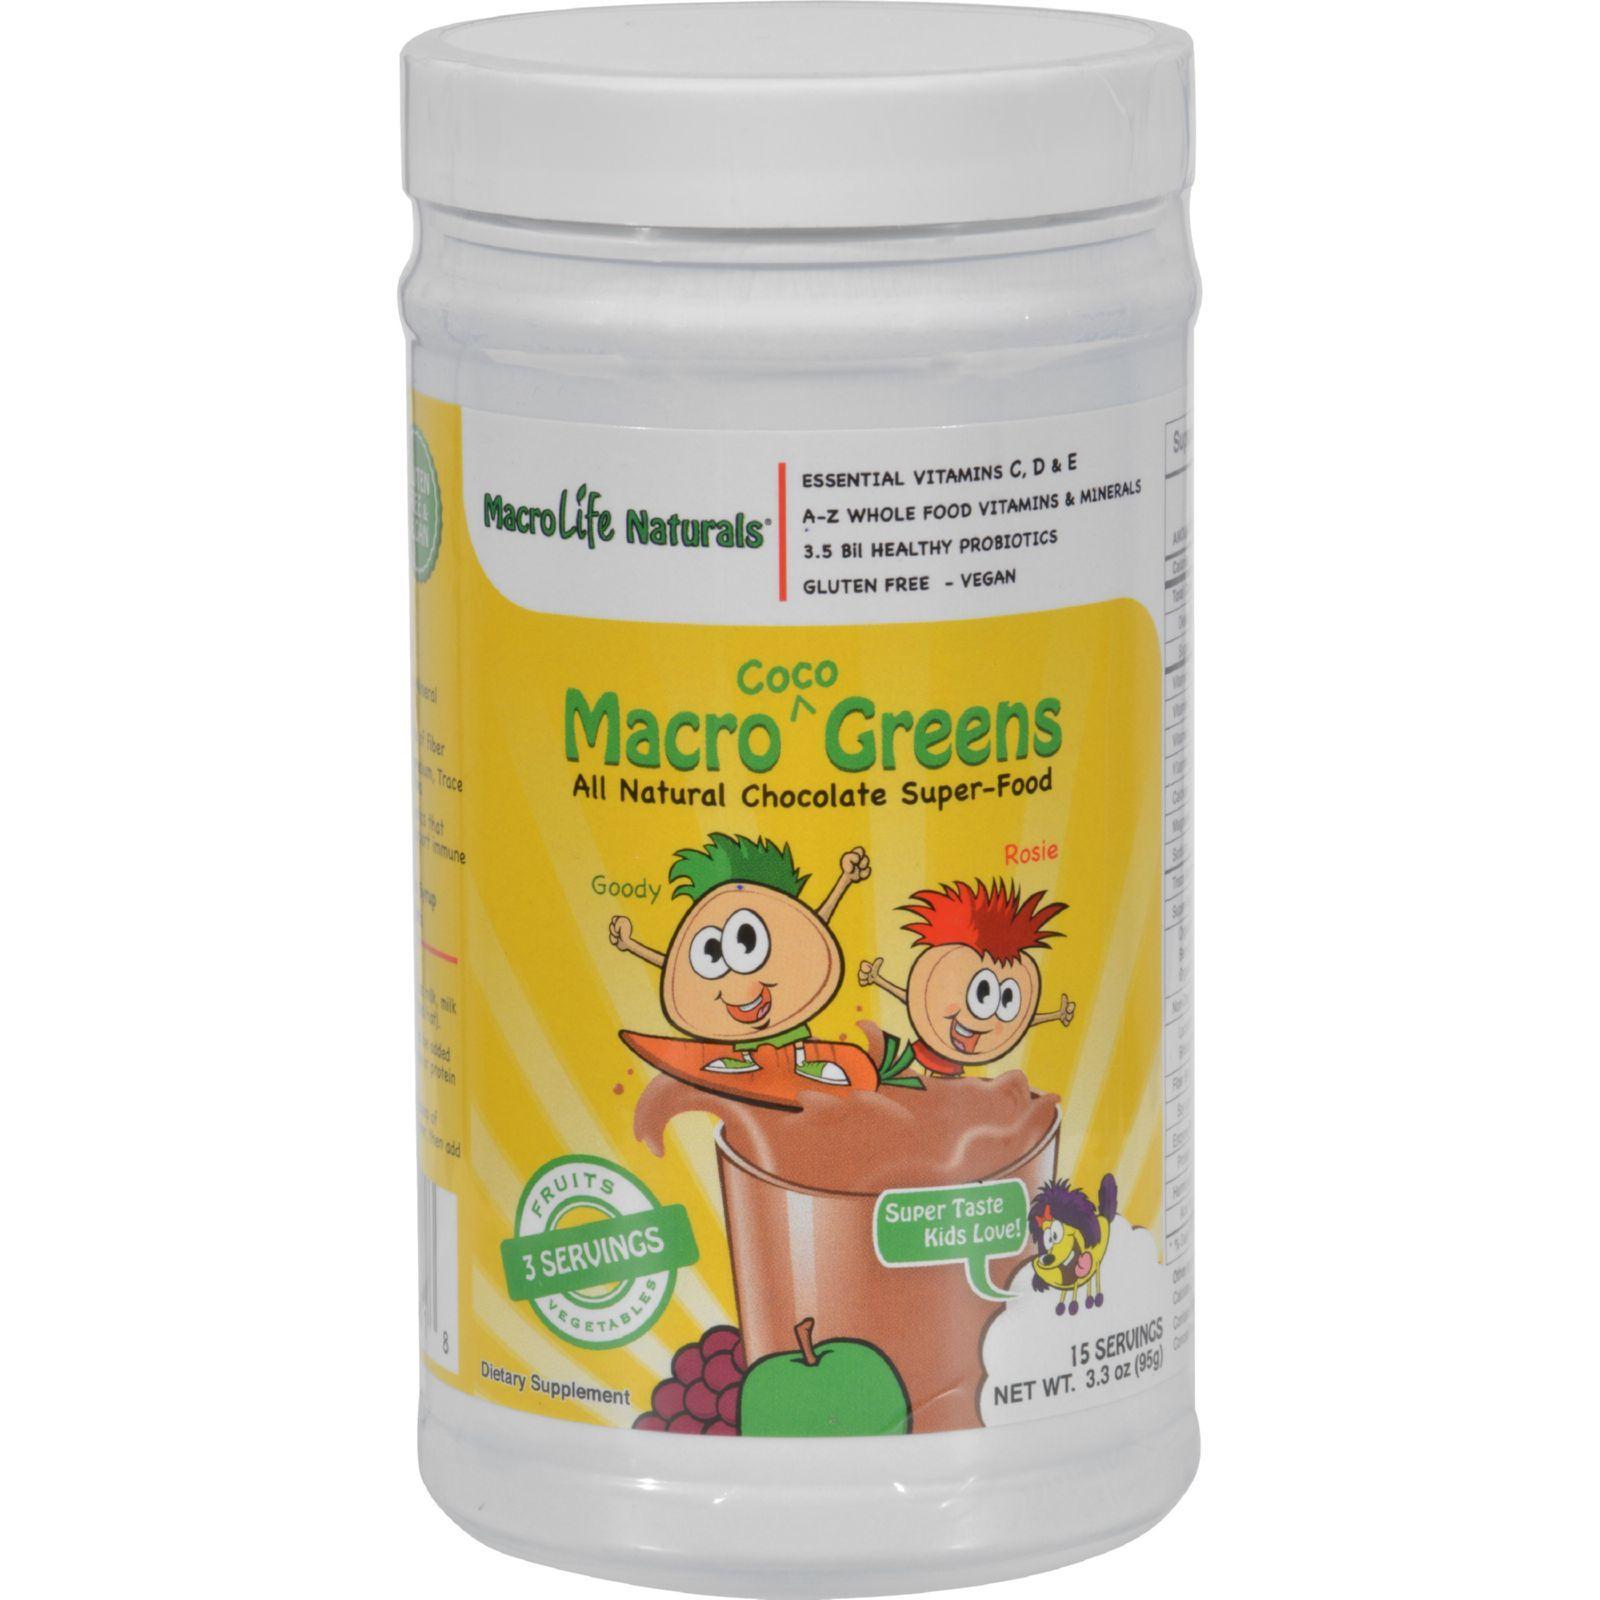 MacroLife Naturals Jr. Macro Coco-Greens for Kids Chocolate - 3.3 oz